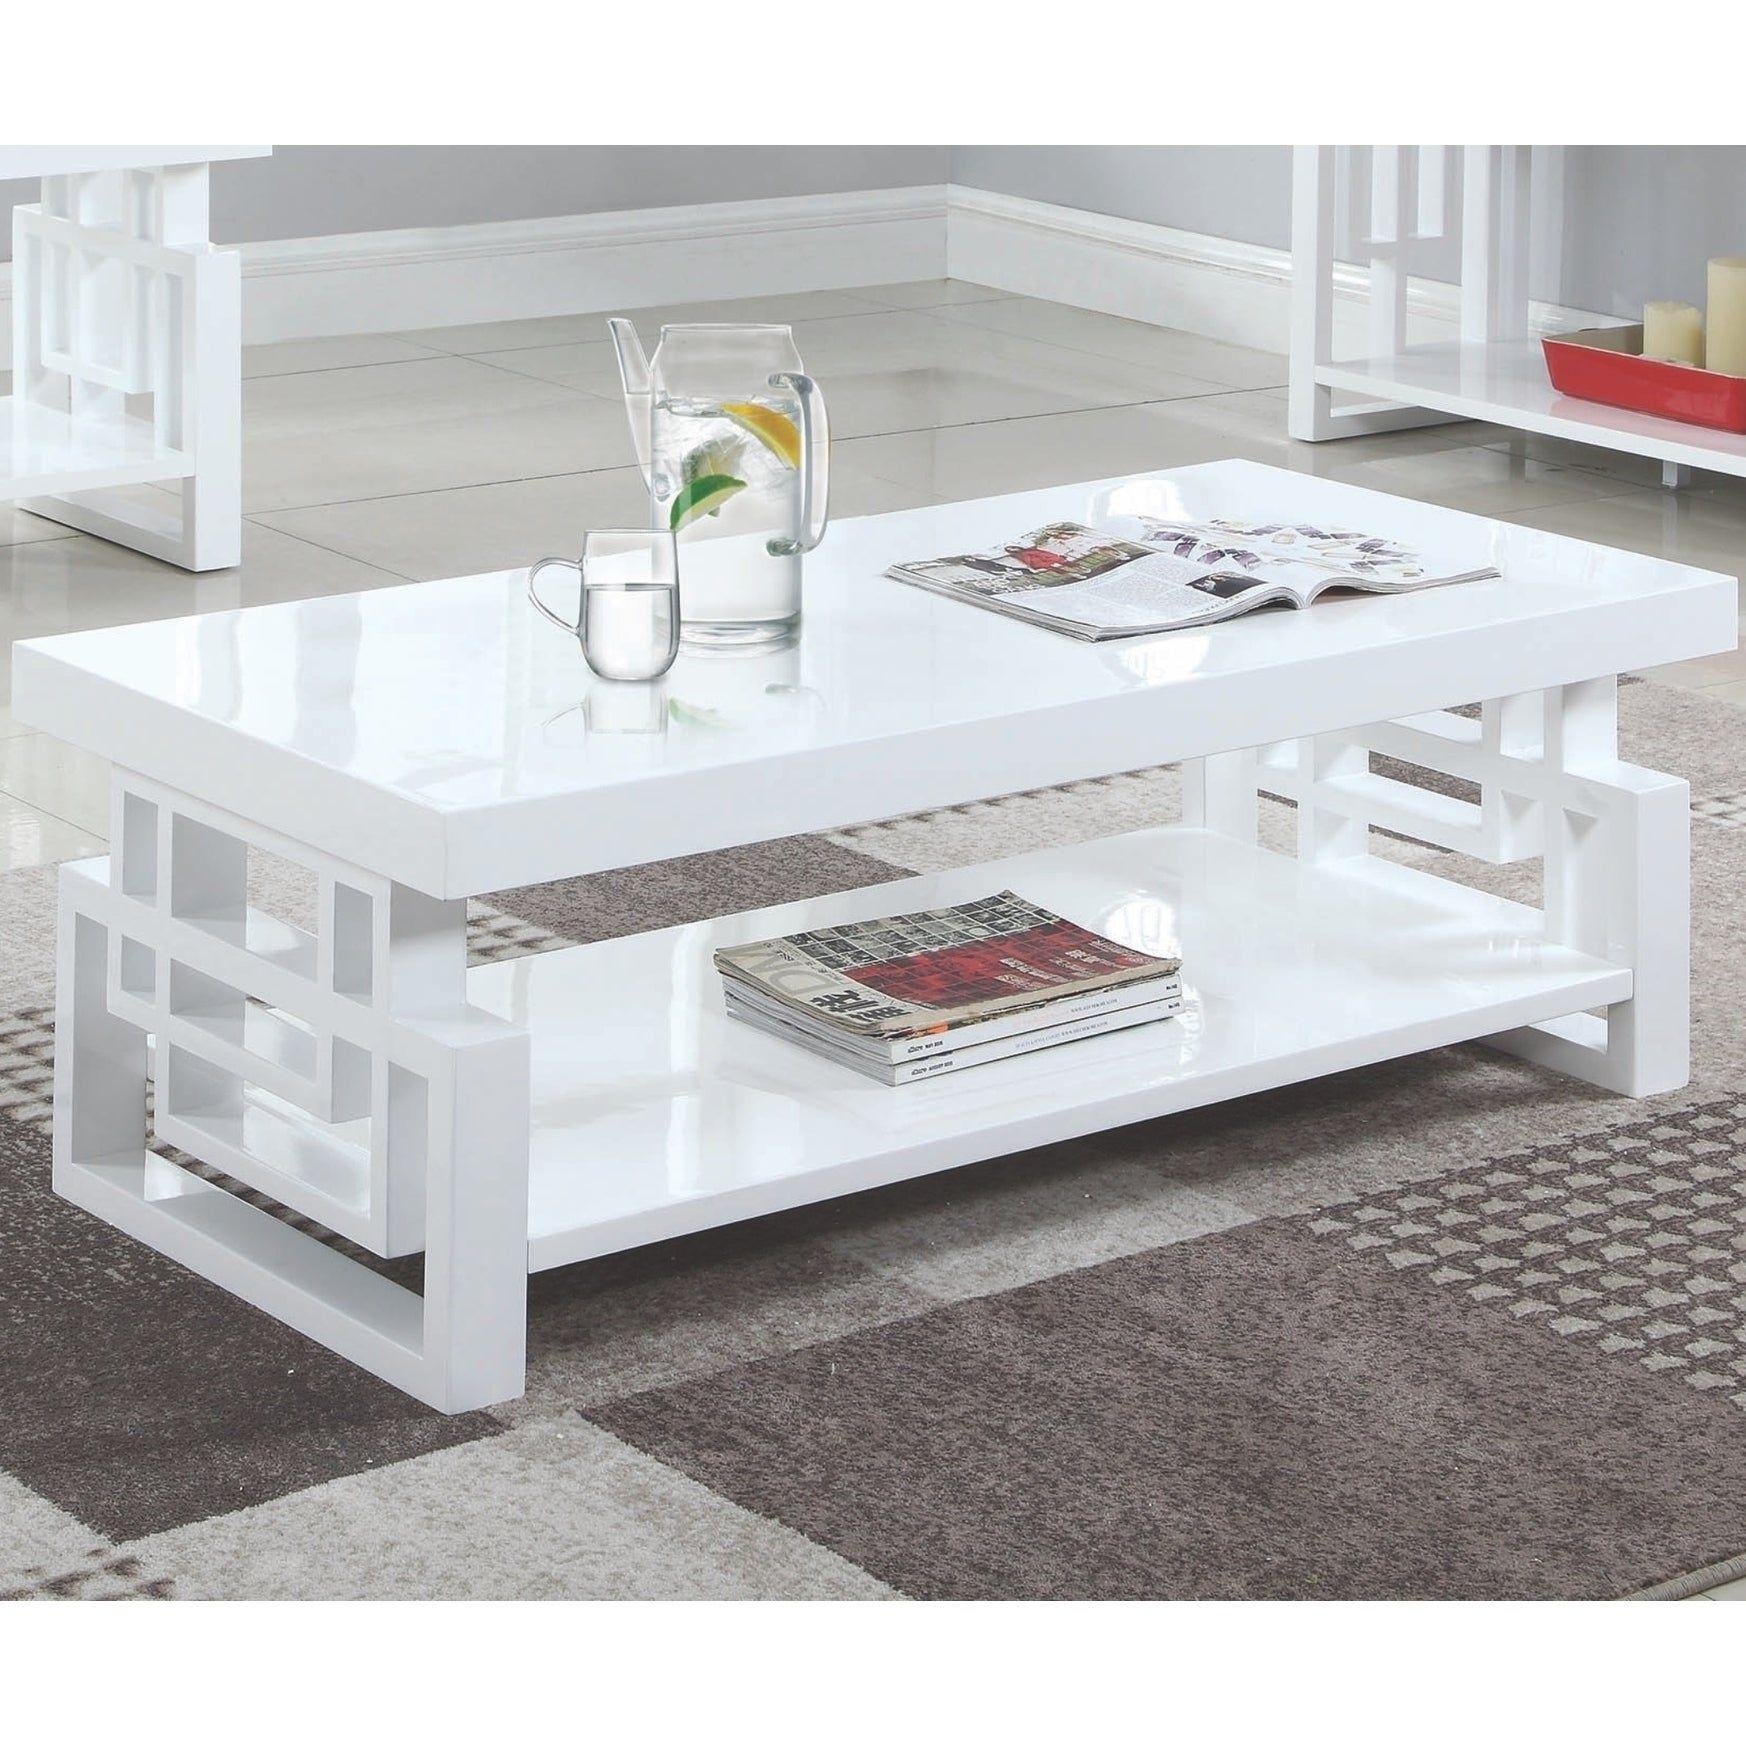 Modern Artistic Design High Glossy White Coffee Table Coffee